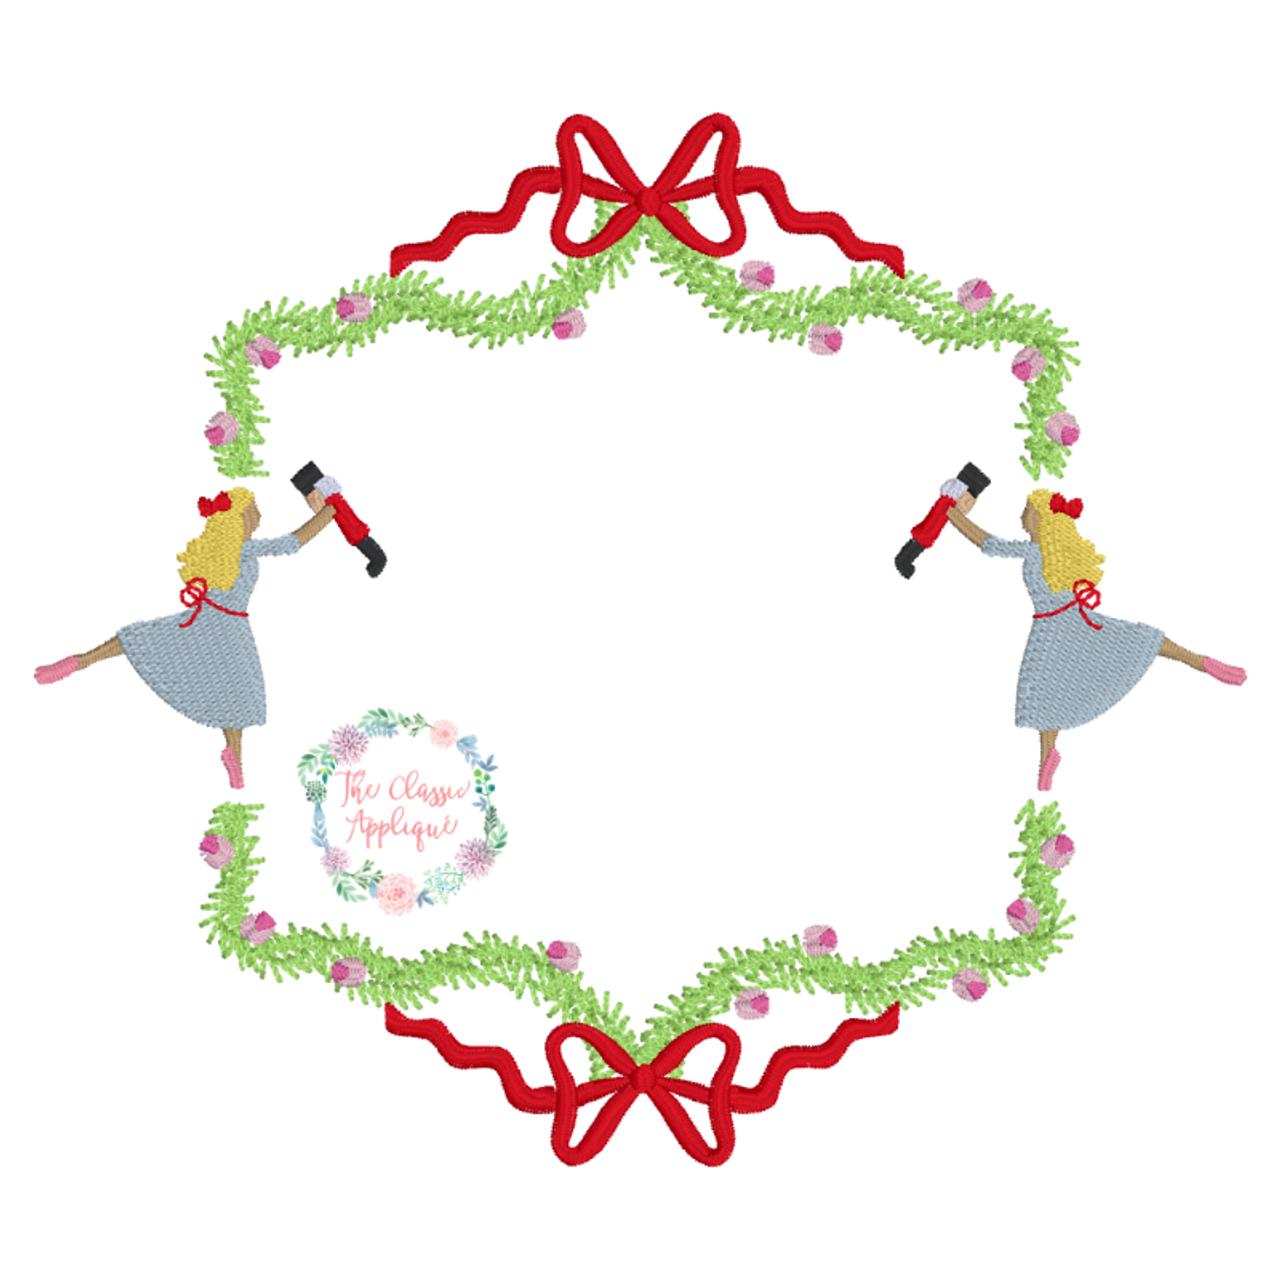 Christmas Nutcracker Monogram Frame Machine Embroidery Design File By The Classic Applique